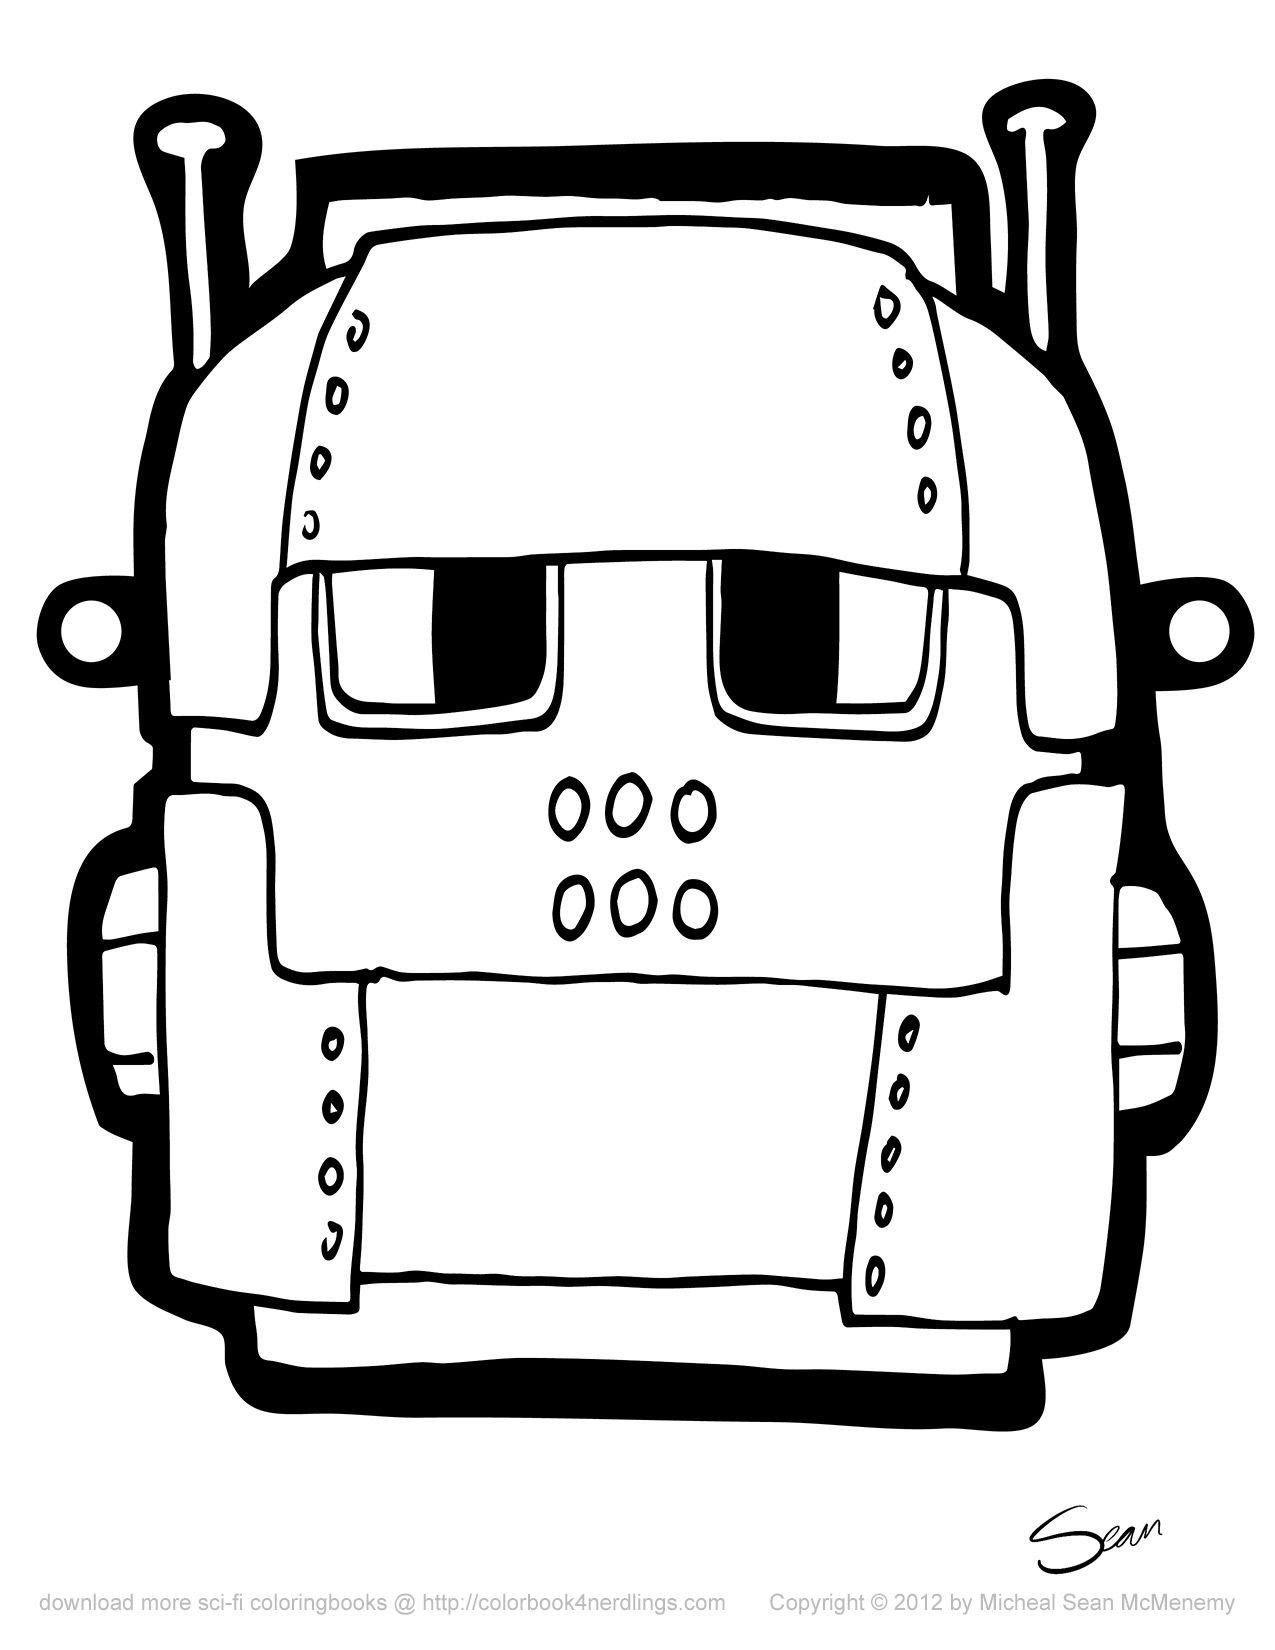 Free coloring books for nerdlings. 8 robot mask printables | 宇宙 ...